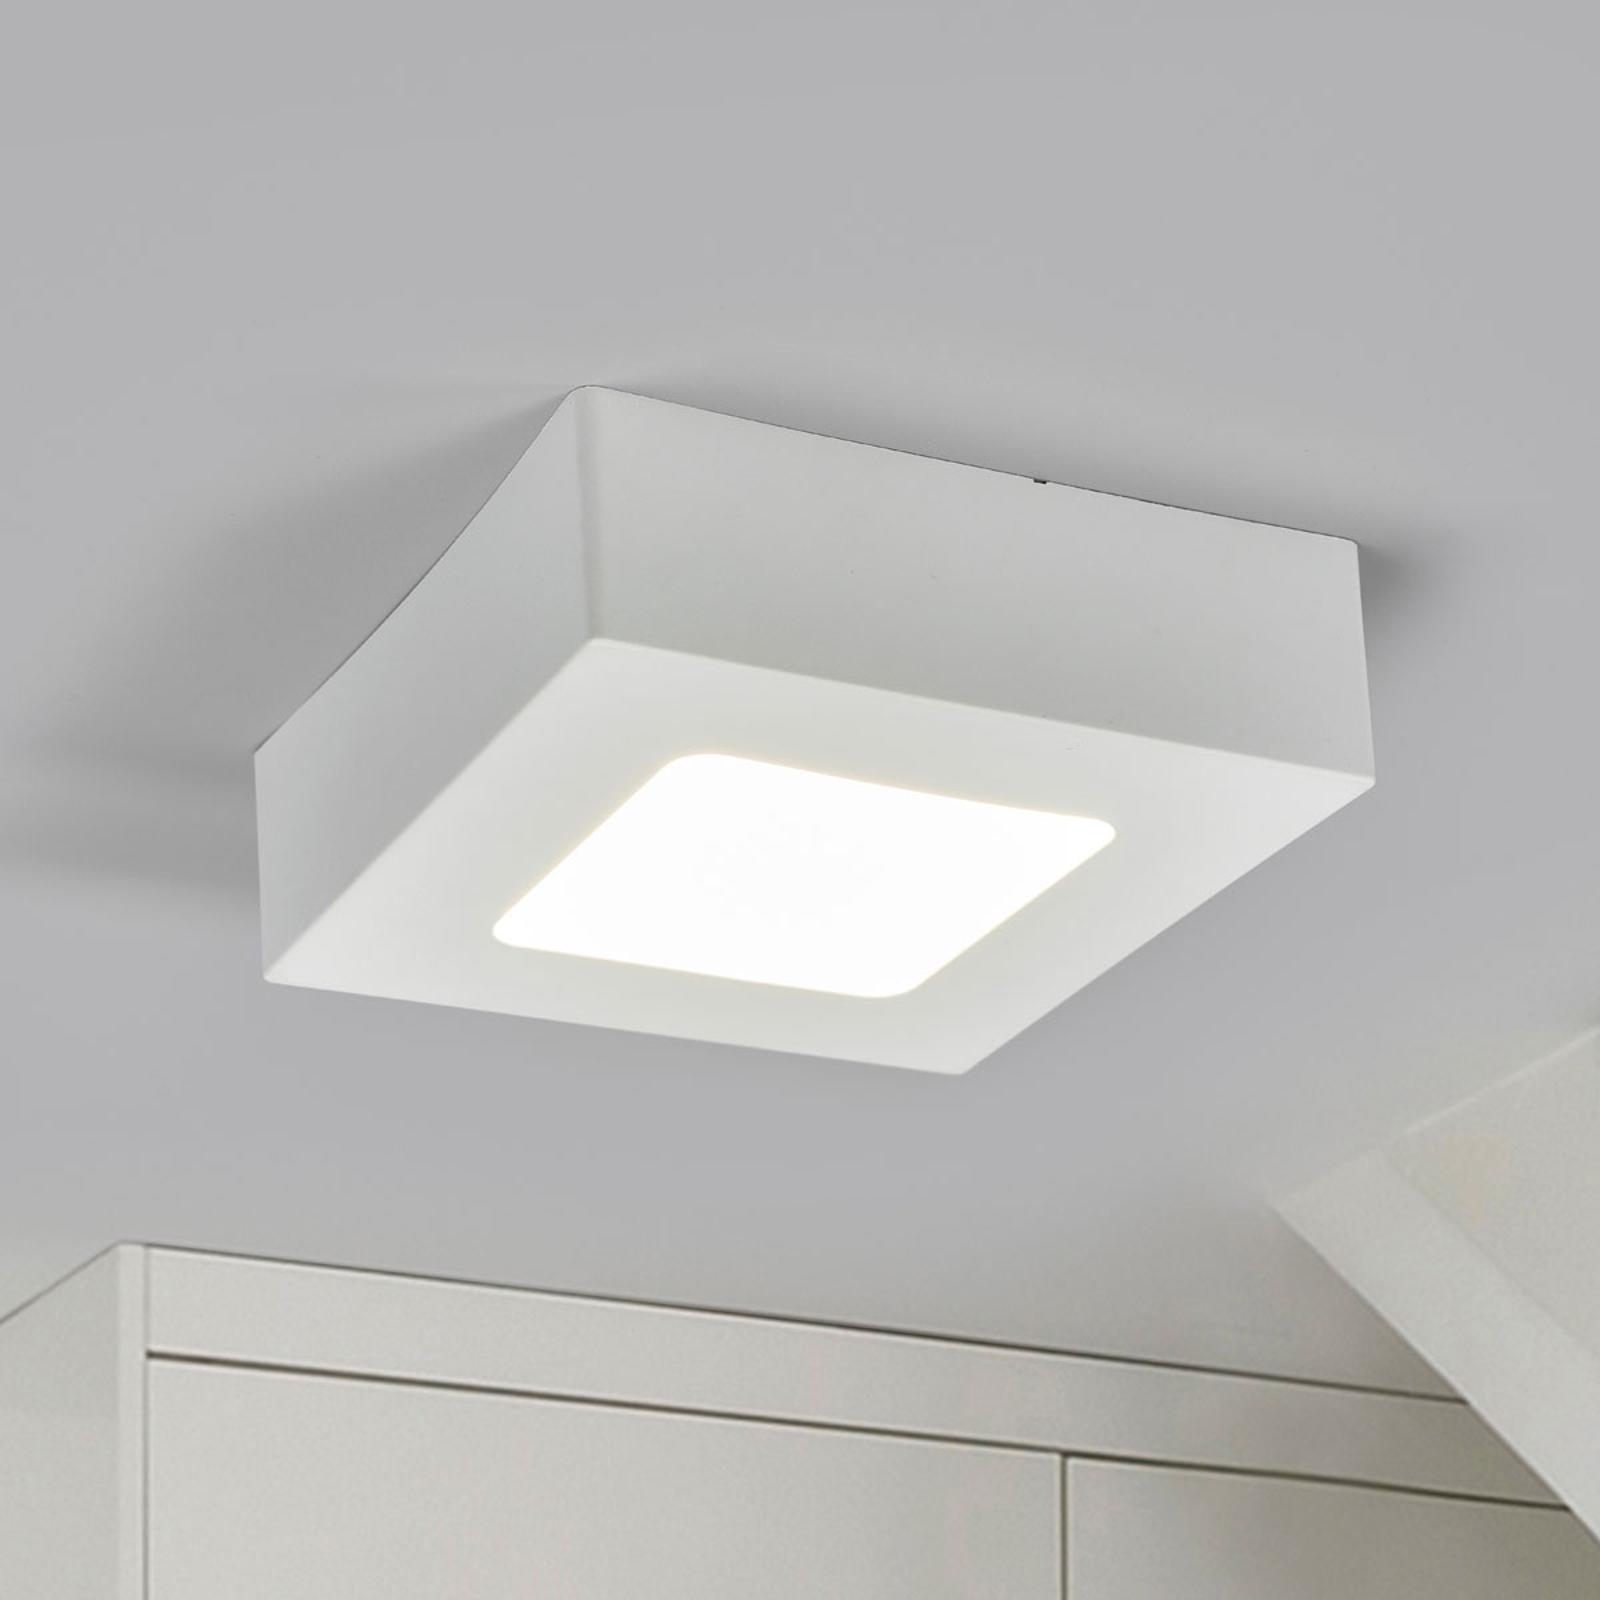 LED-taklampe Marlo, hvit, 4000K kantet 12,8cm